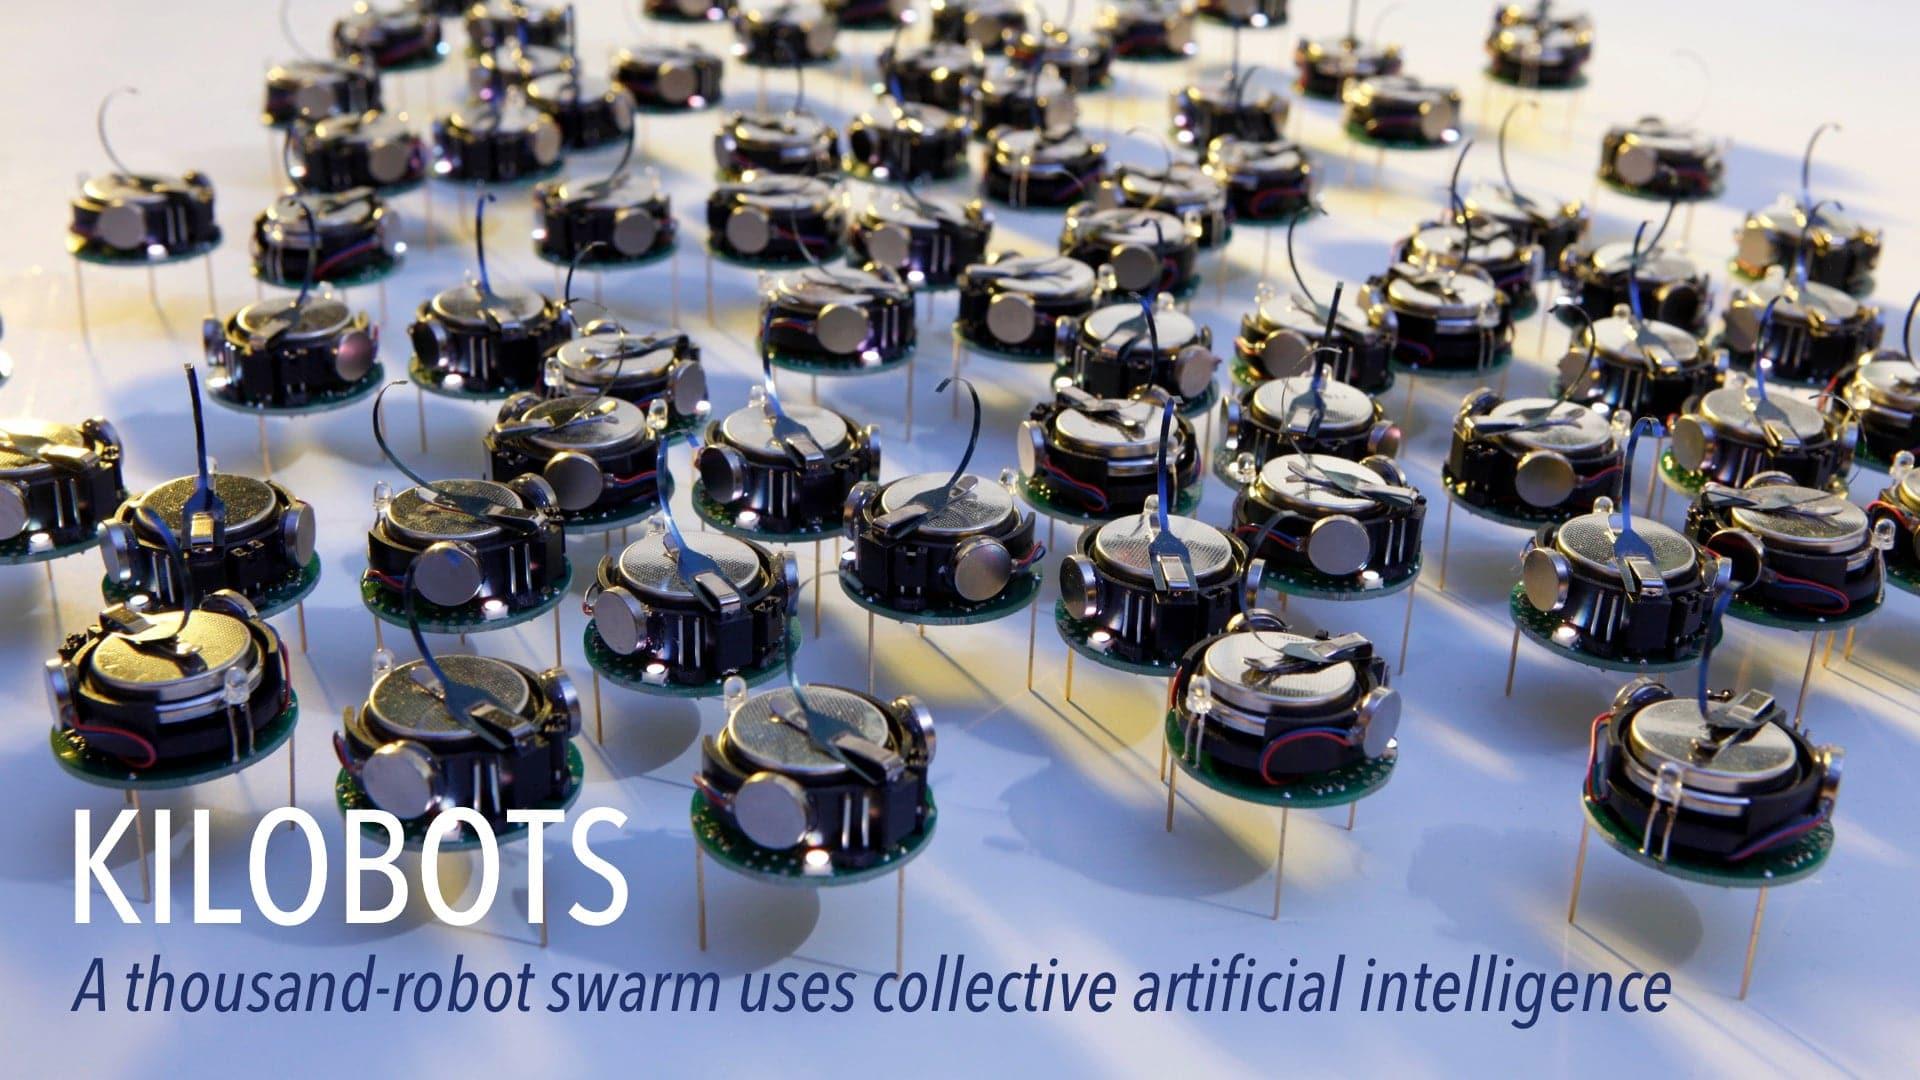 a thousand-robot swarm